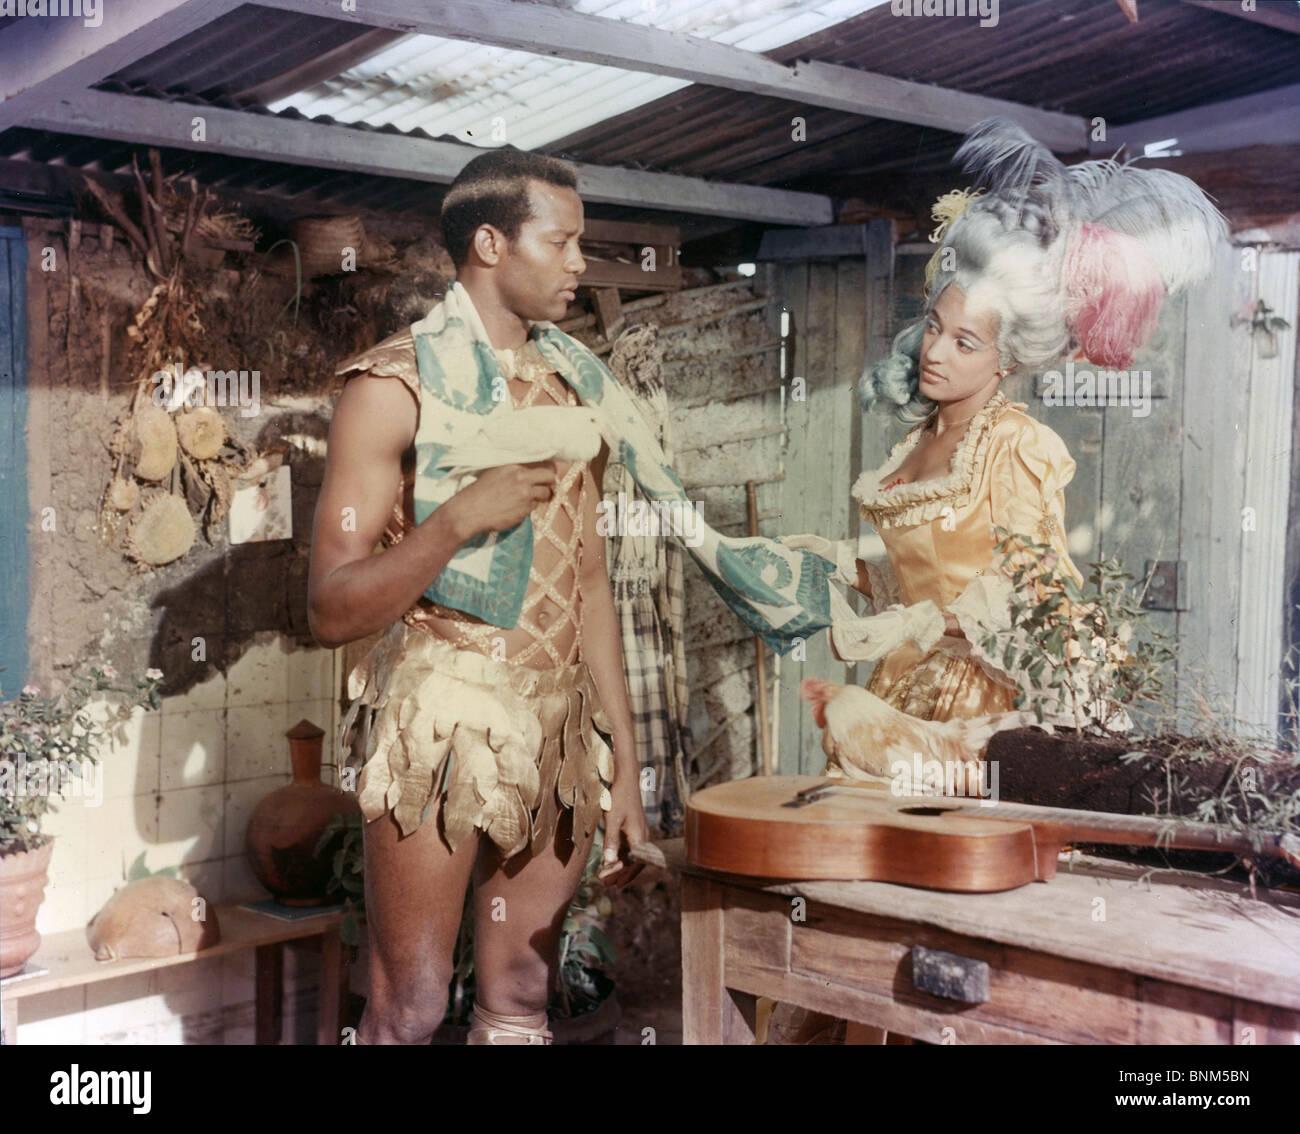 BLACK ORPHEUS (1959) ORFEU NEGRO (ALT) MARCEL CAMUS (DIR) 001 MOVIESTORE COLLECTION LTD Stock Photo